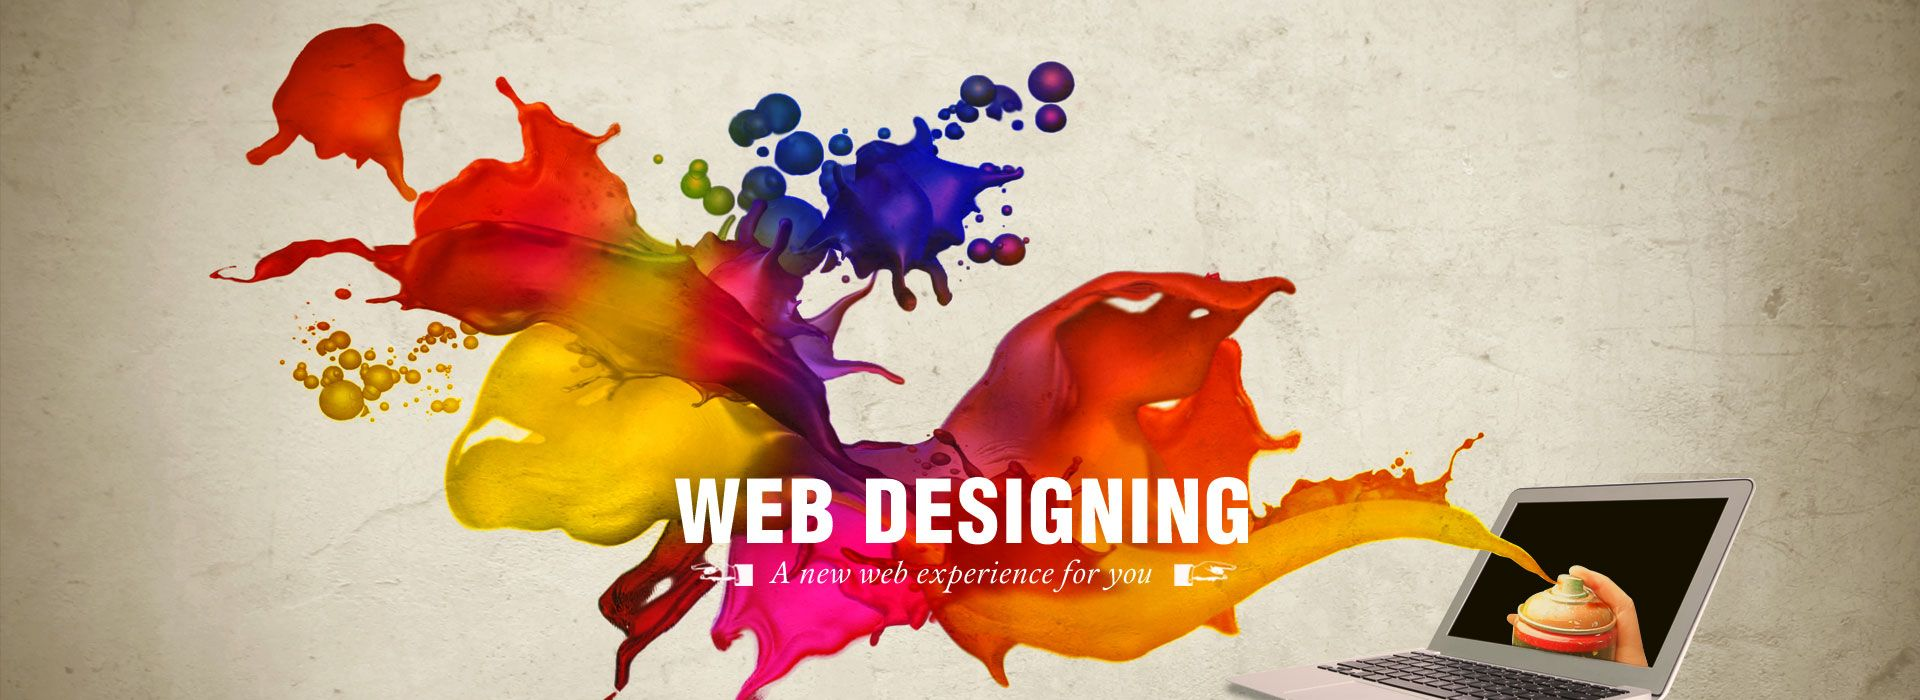 Best Web Designing Company Tirunelveli Responsive Website Design Website Design Services Web Development Design Web Design Services